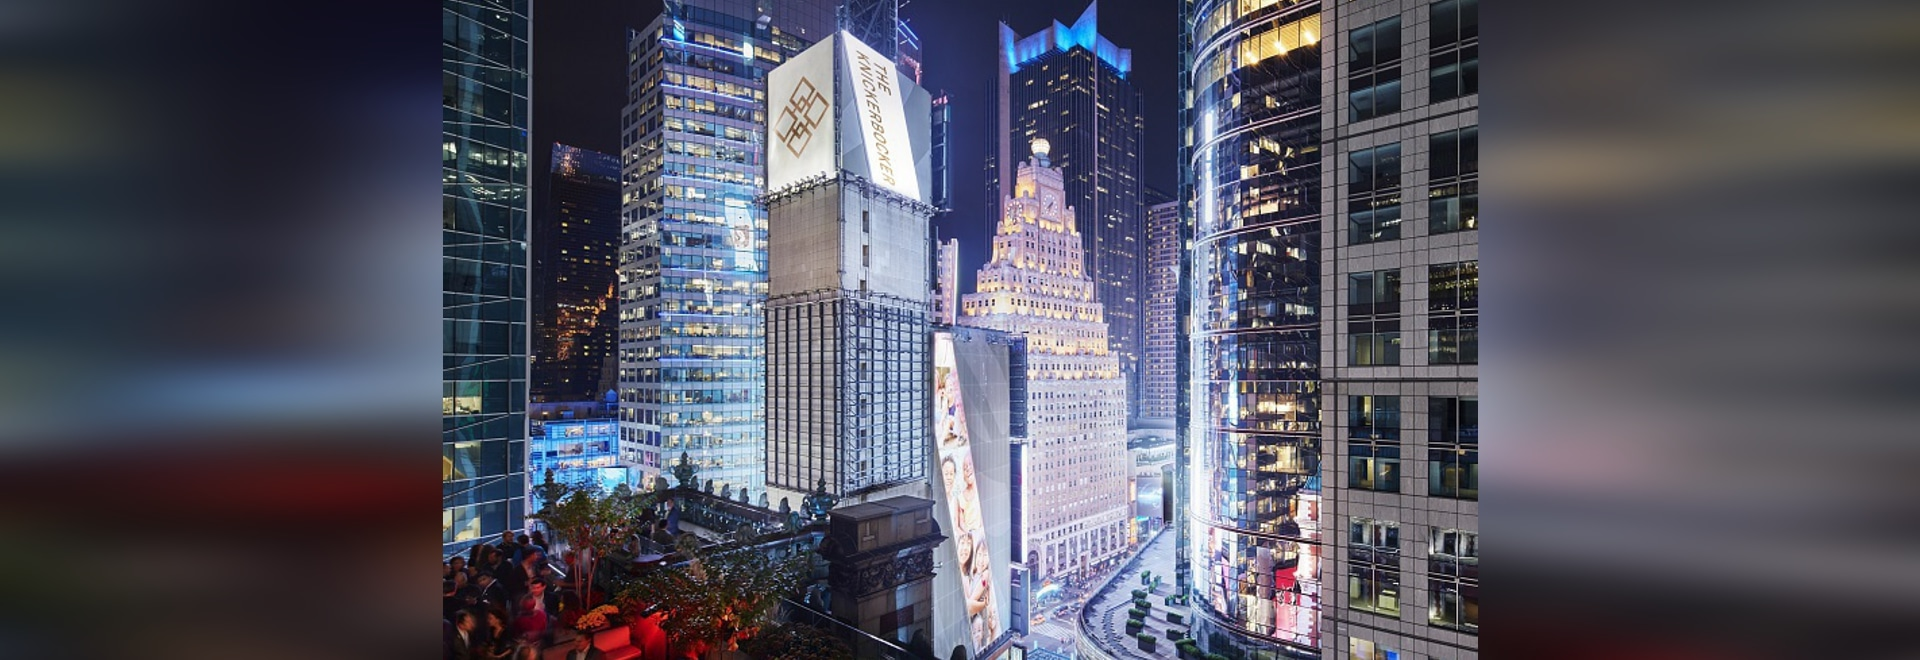 The Knickerbocker New York